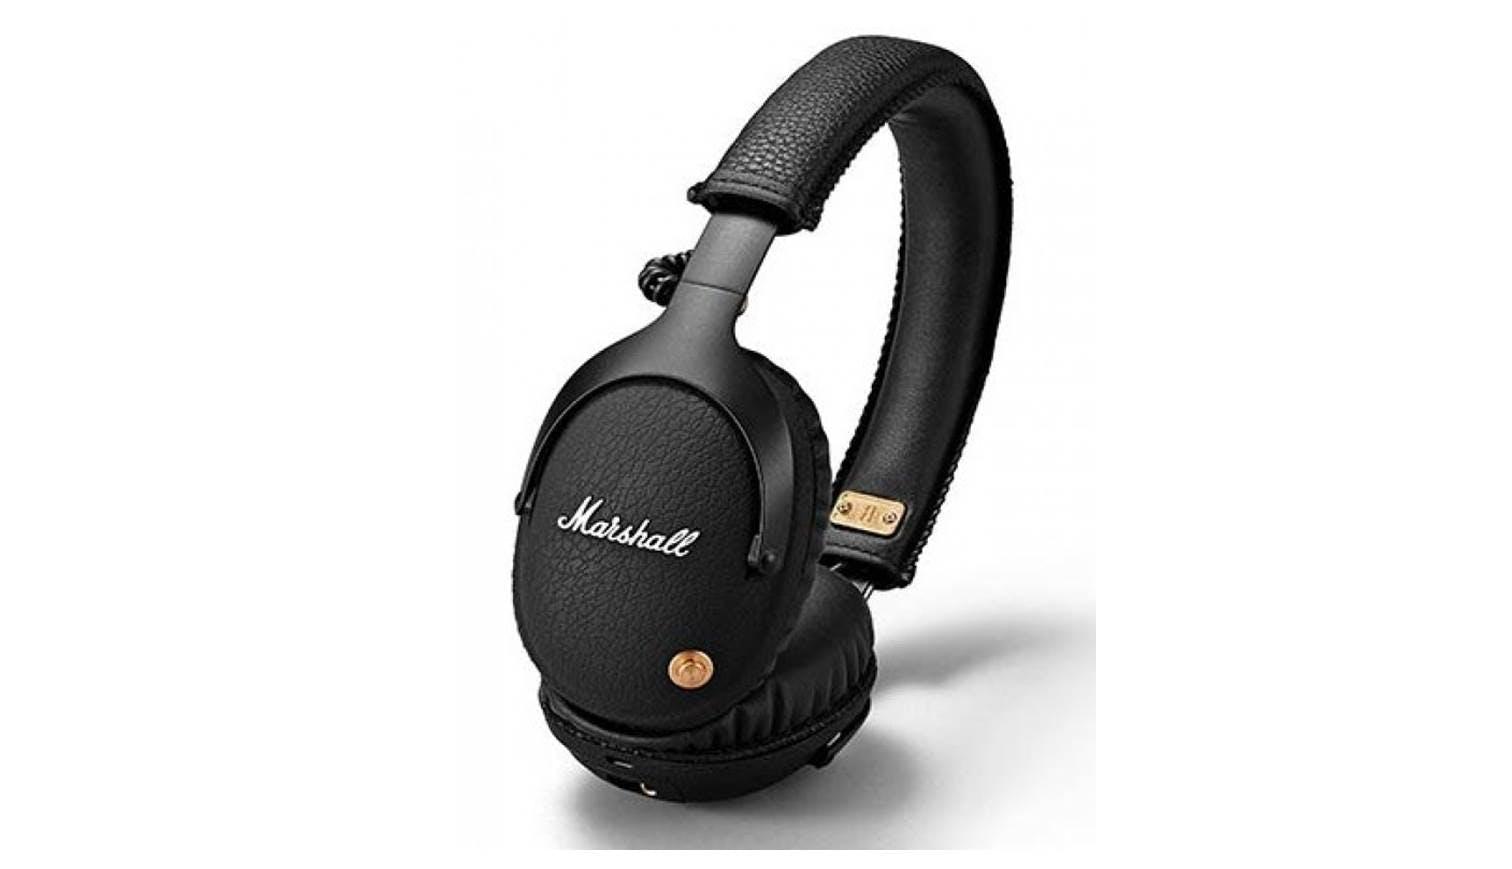 marshall monitor bluetooth over ear headphone black. Black Bedroom Furniture Sets. Home Design Ideas